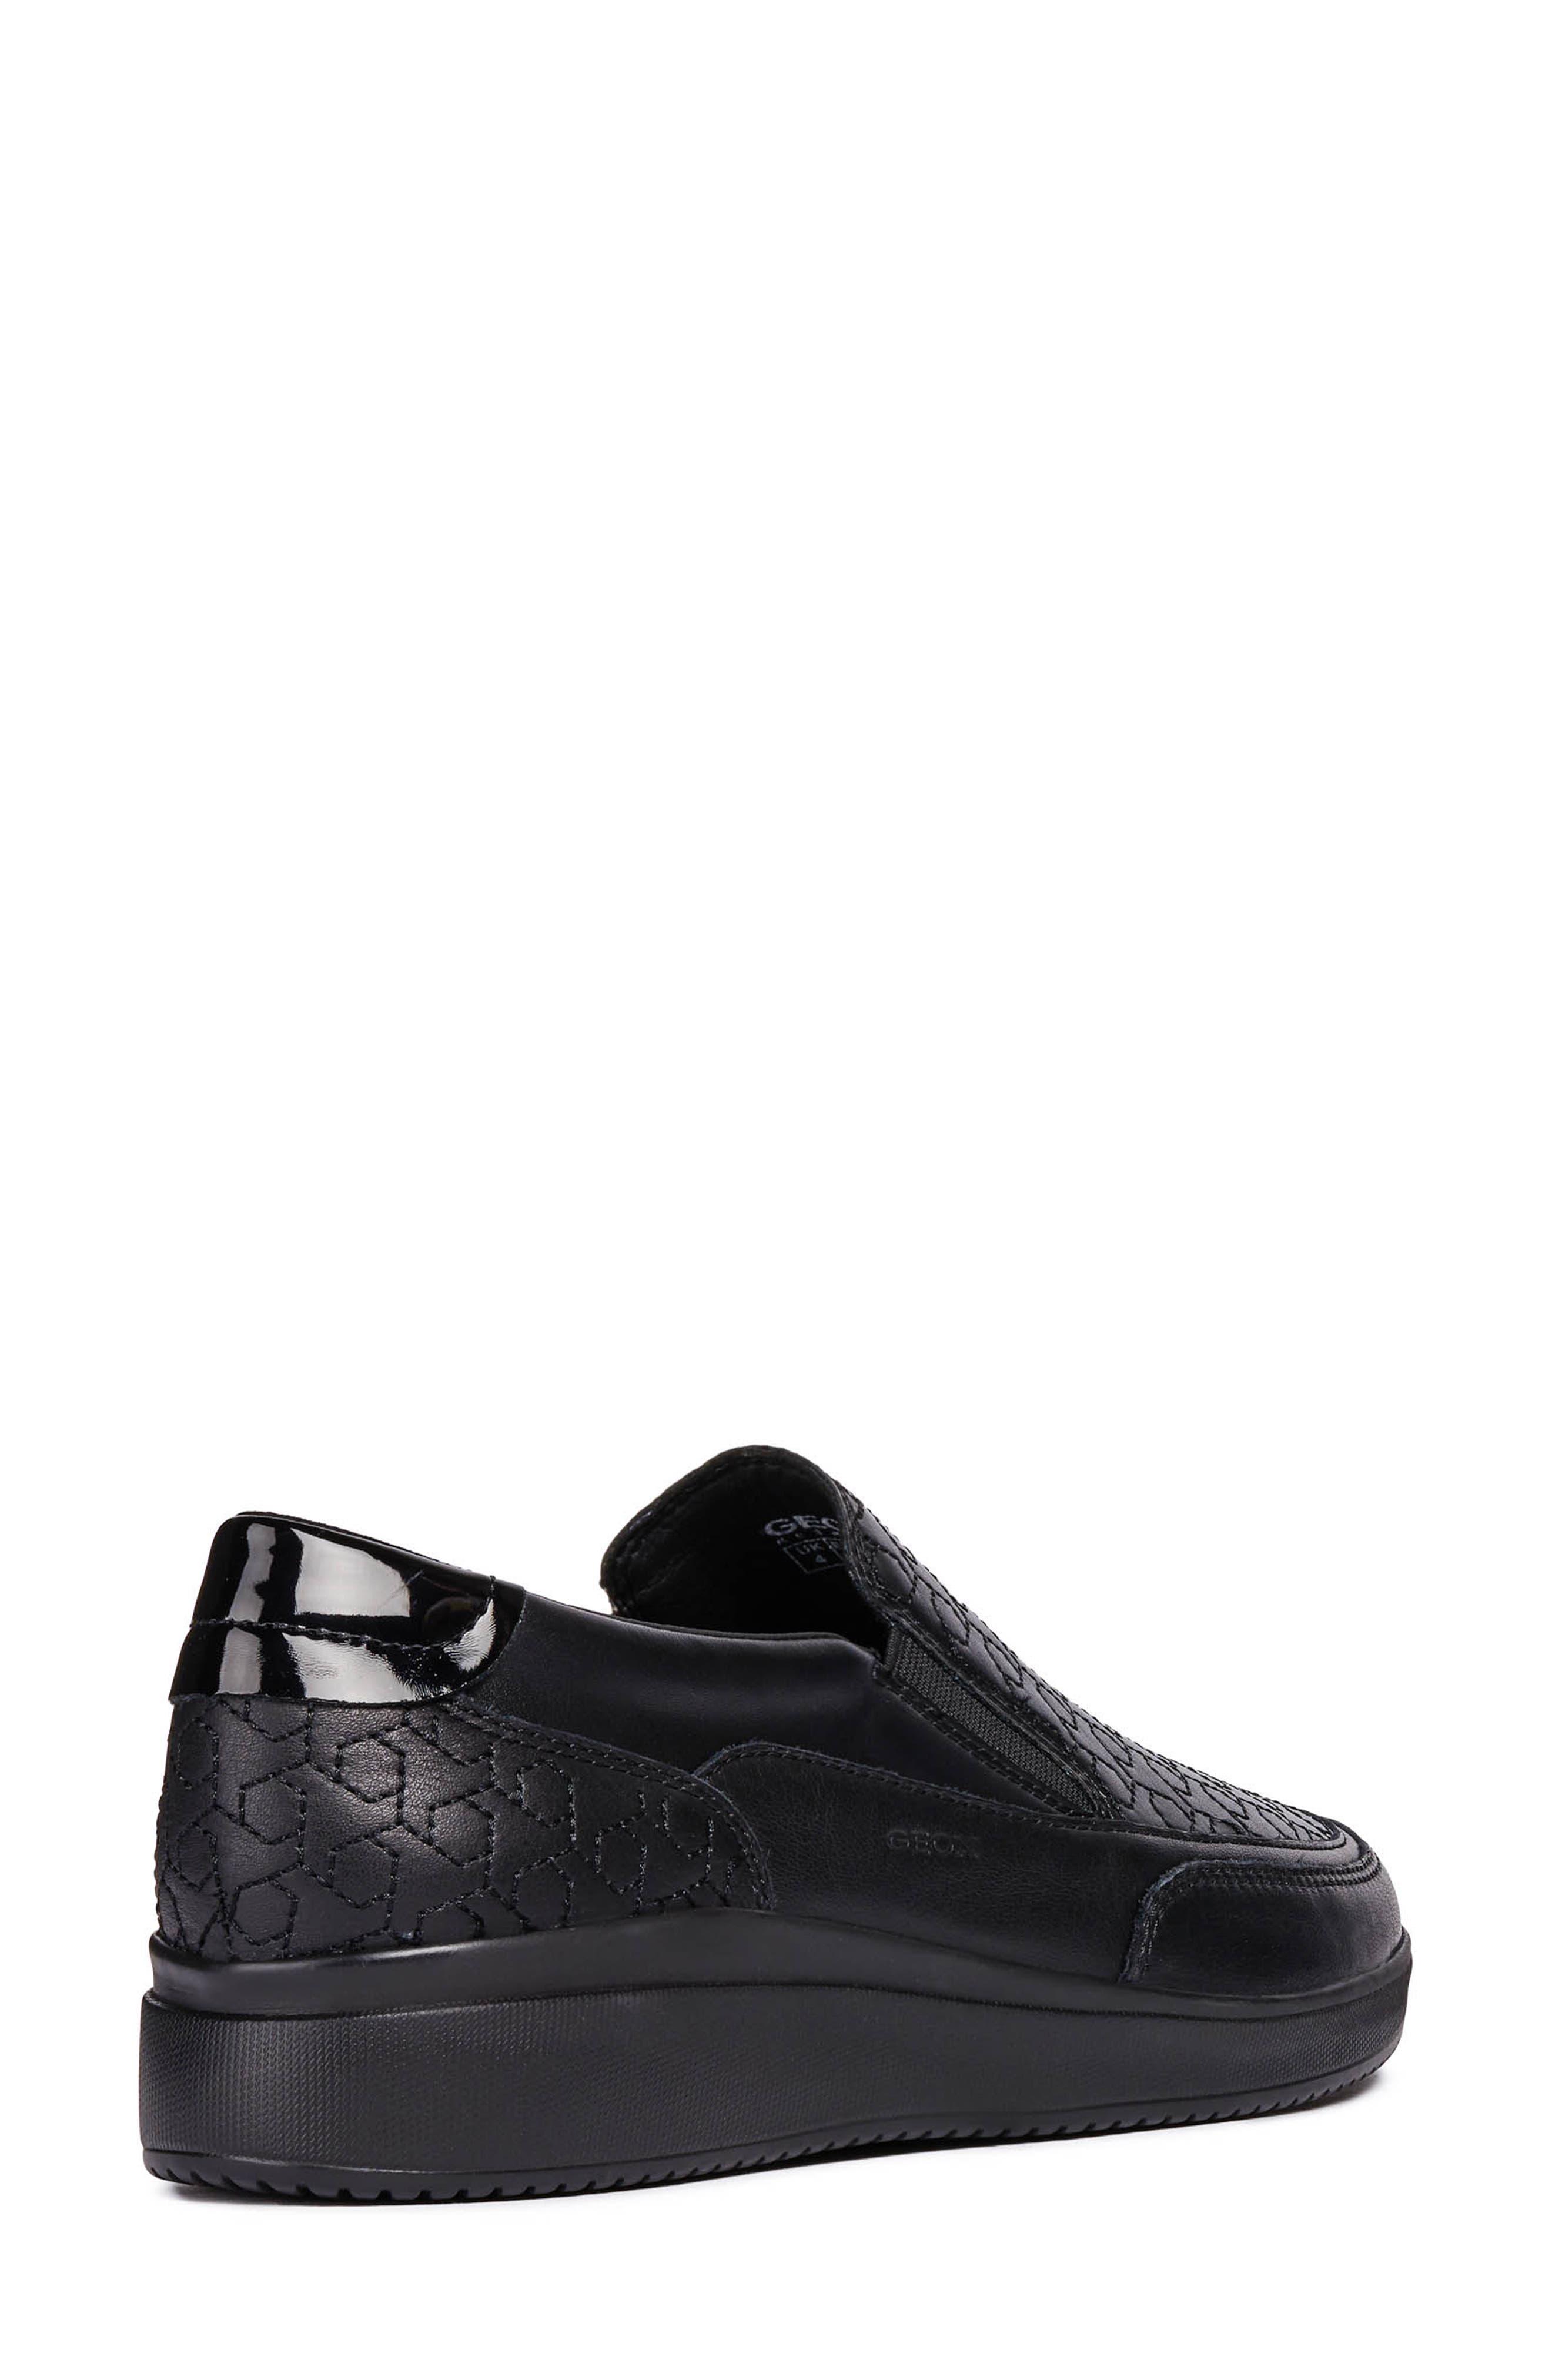 Tahina Slip-On Sneaker,                             Alternate thumbnail 2, color,                             BLACK FABRIC